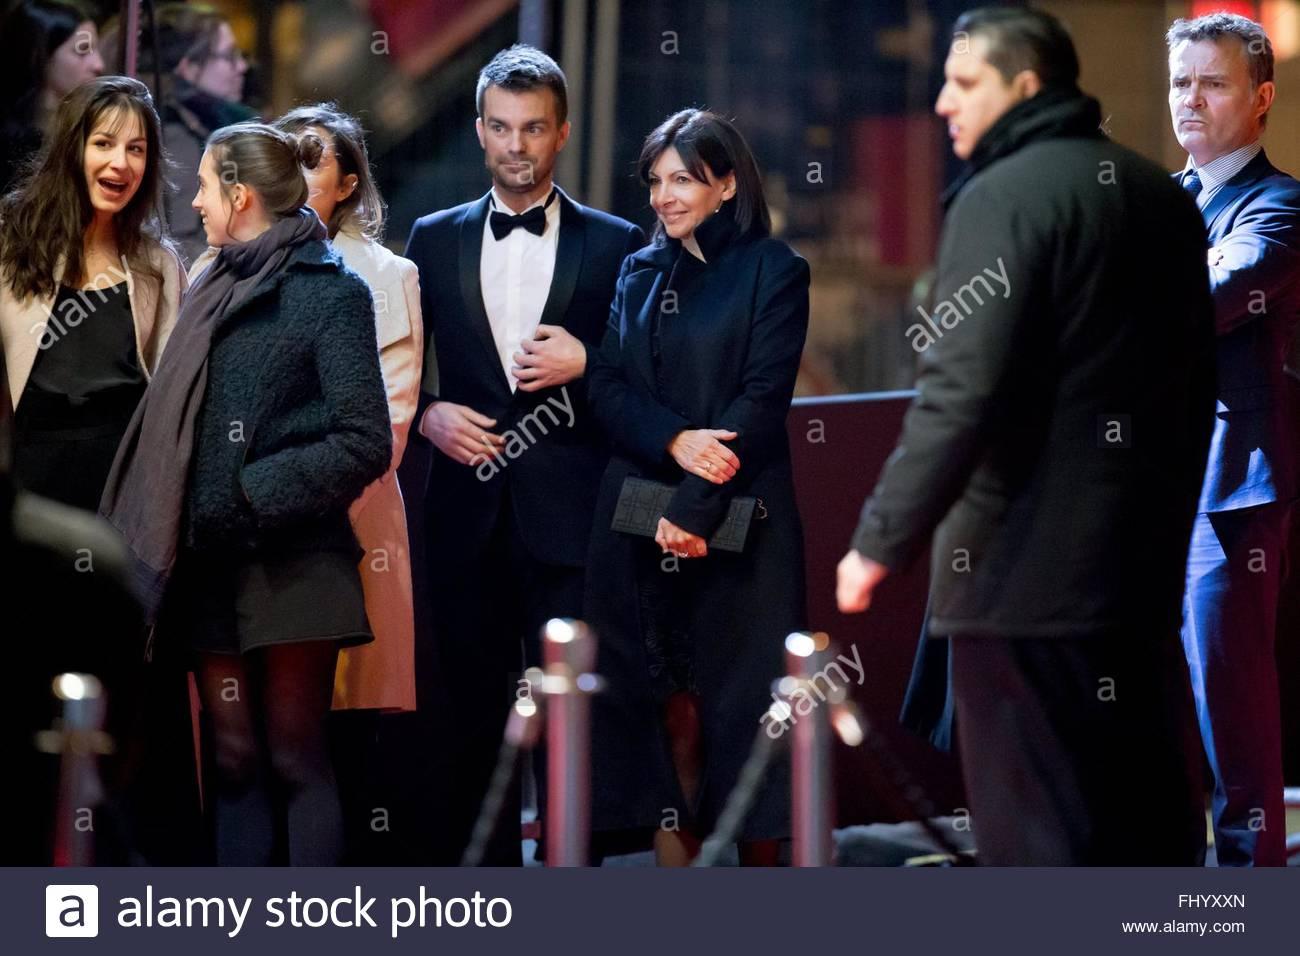 Paris, France. February 26th, 2016. FRANCE, Paris: Mayor of Paris Anne Hidalgo (3rdR) walks on the red carpet of - Stock Image